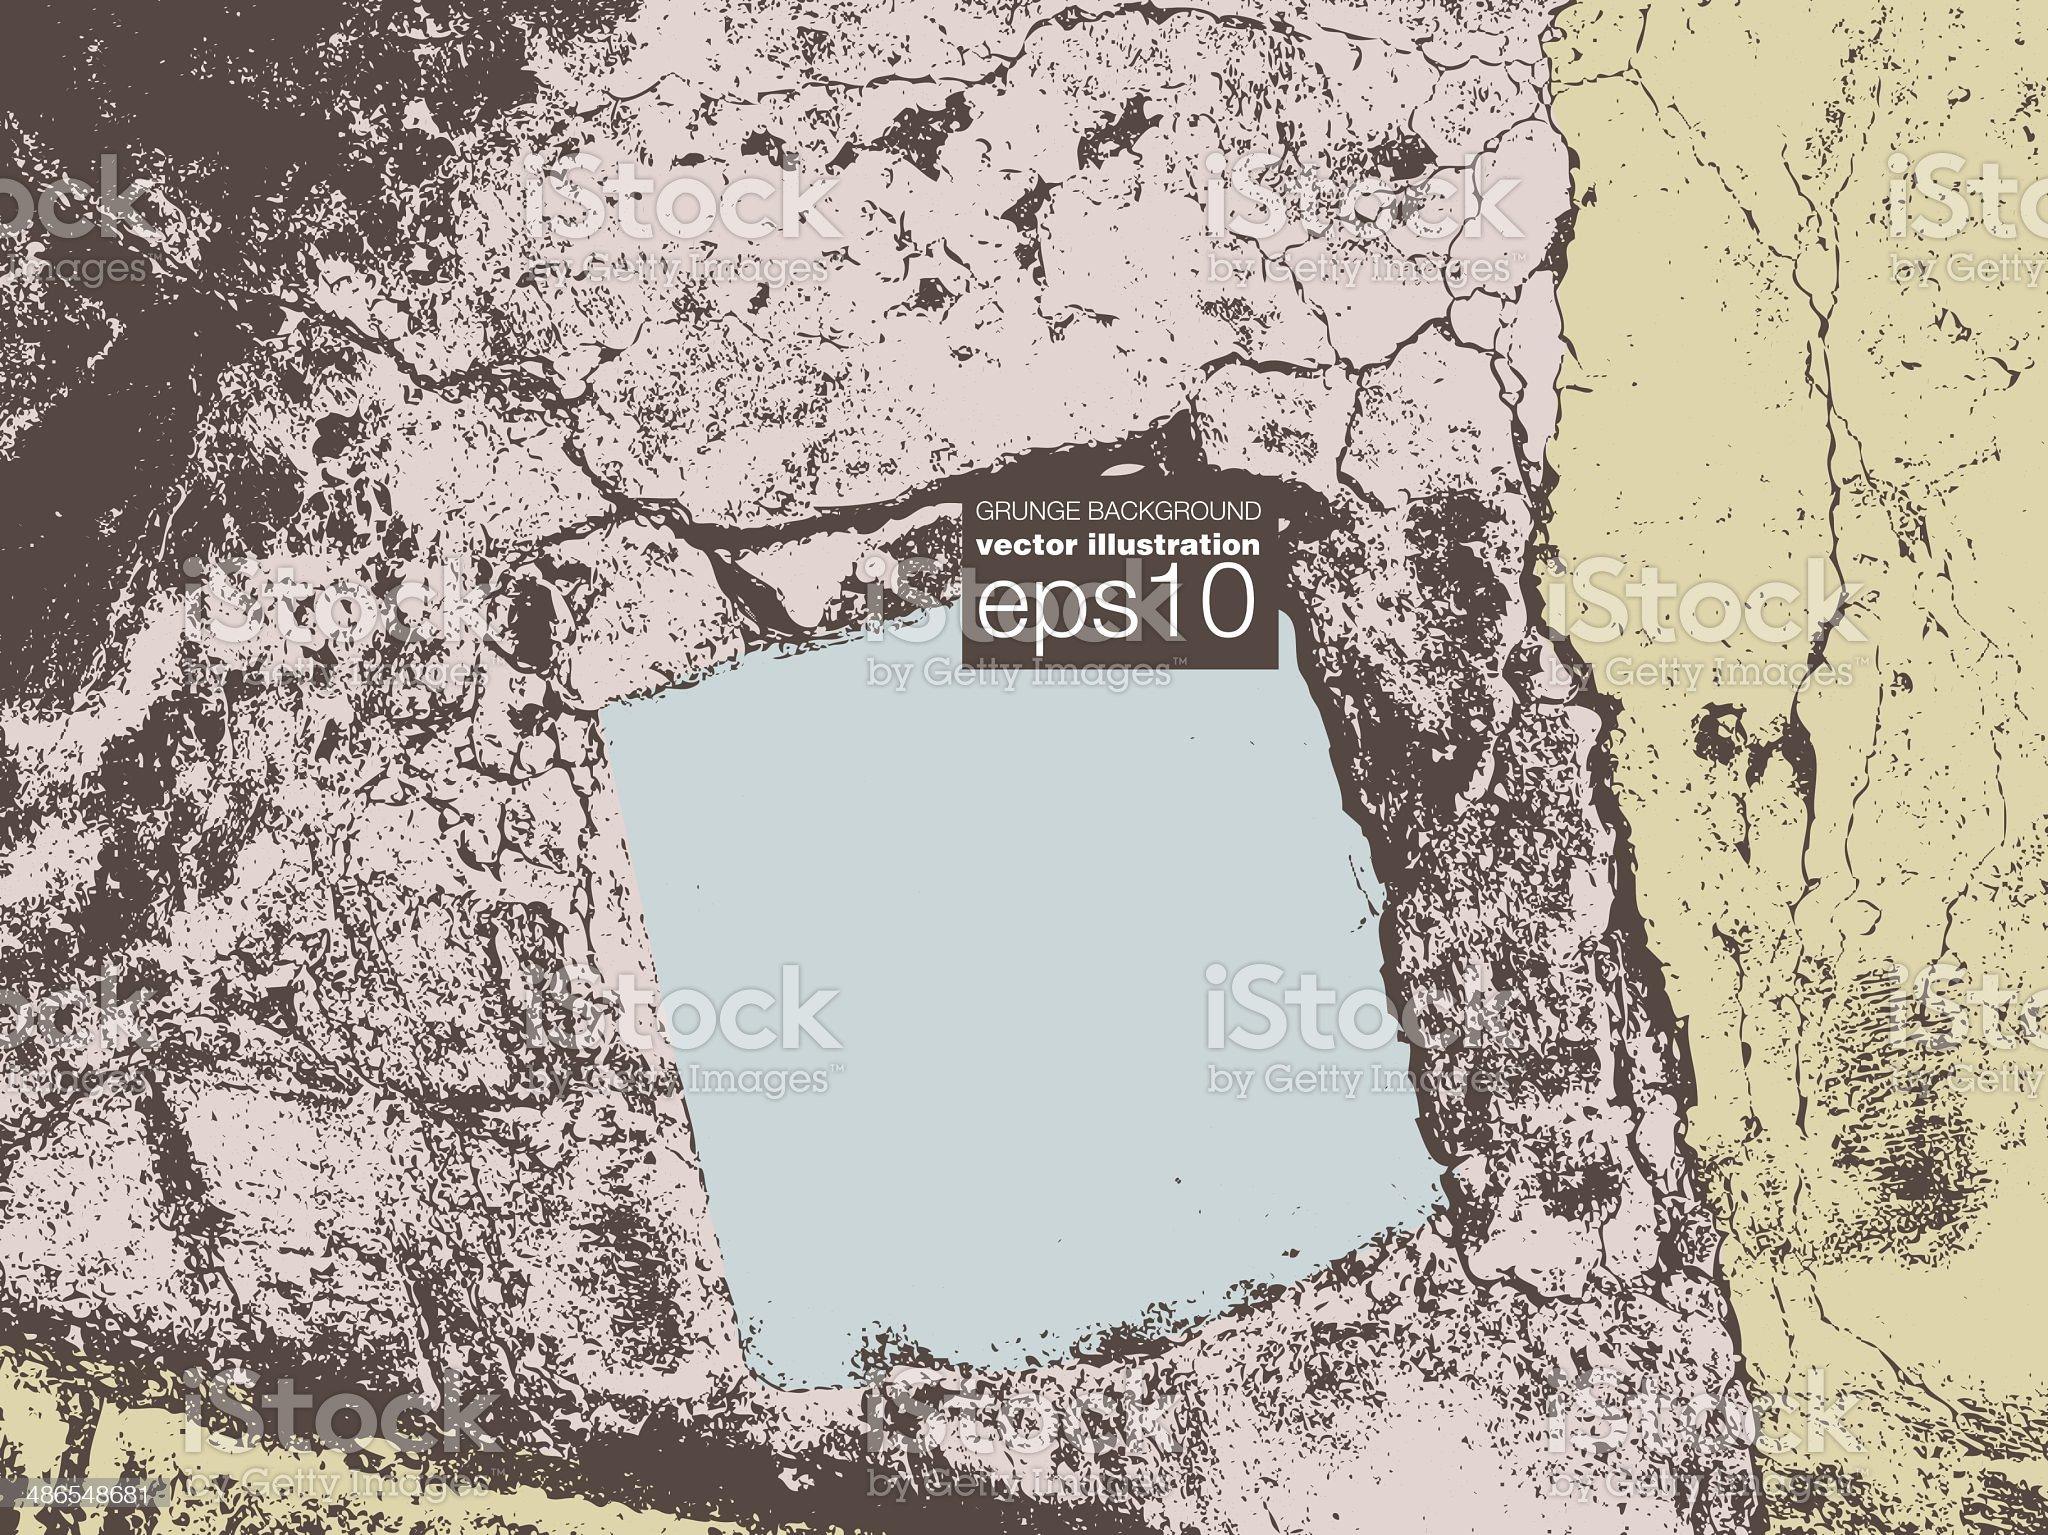 Grunge vector background illustration royalty-free stock vector art